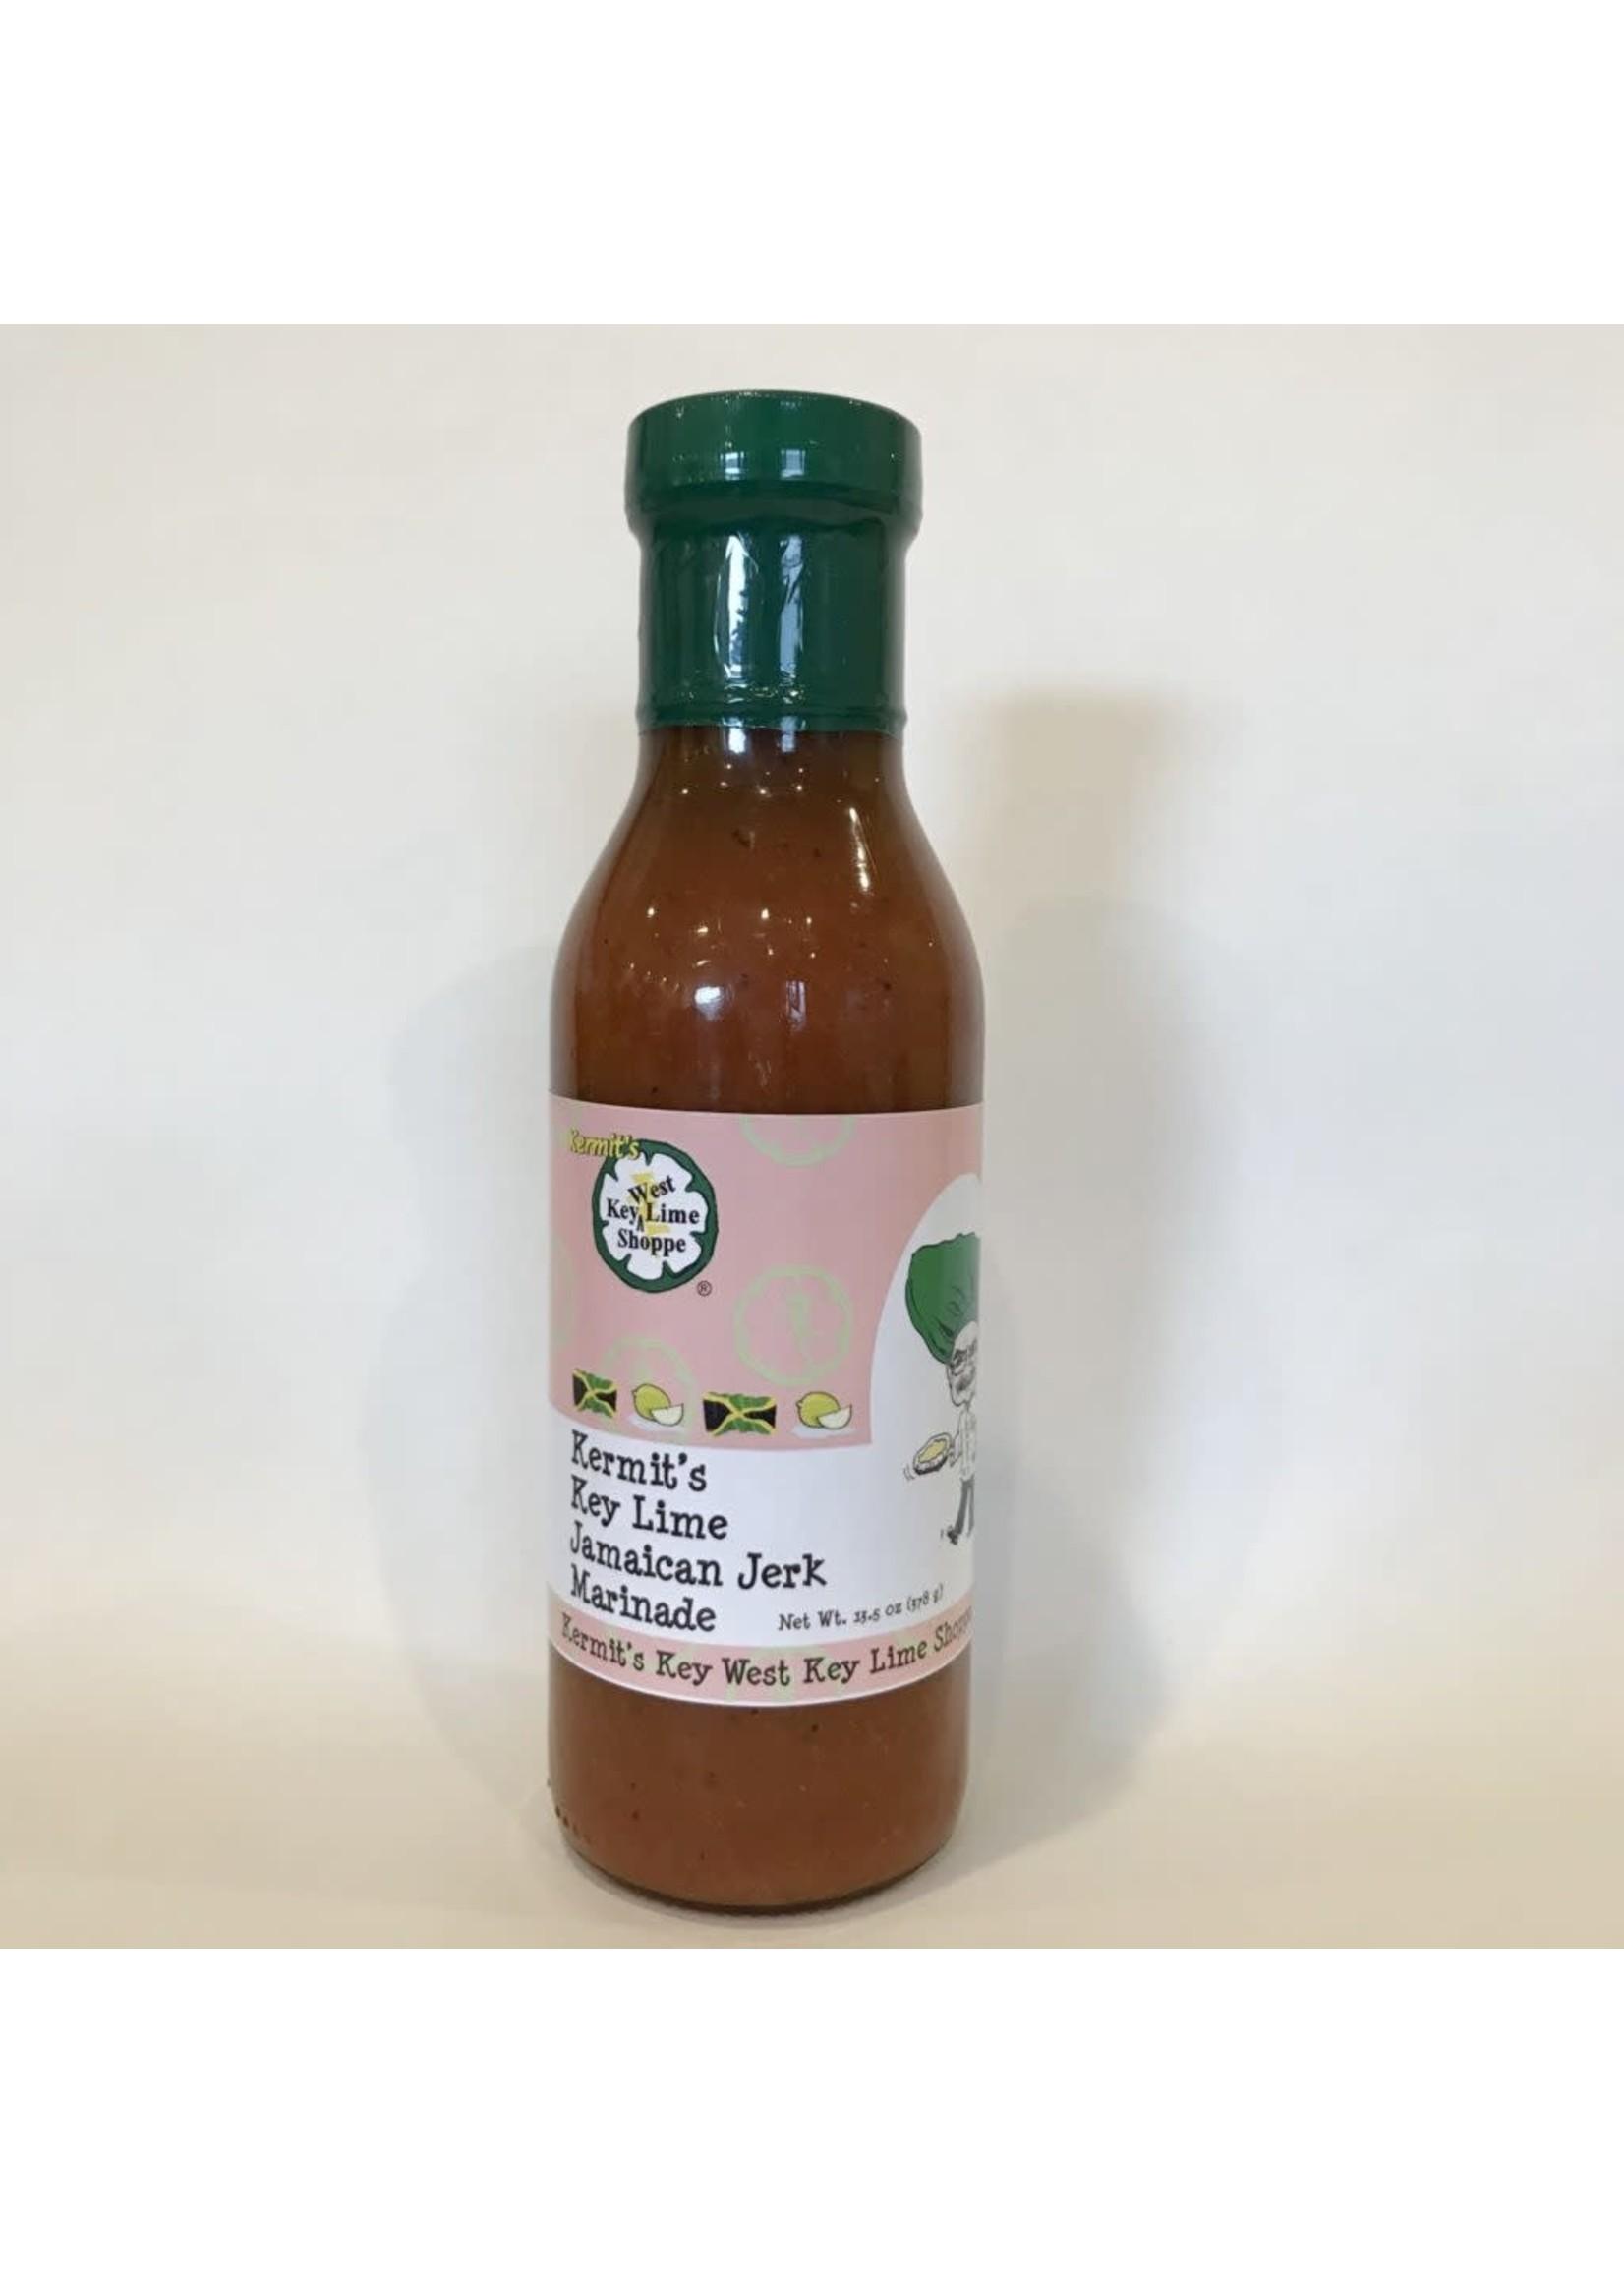 Kermit's Key Lime  Jamaican Jerk Marinade  13.5 oz